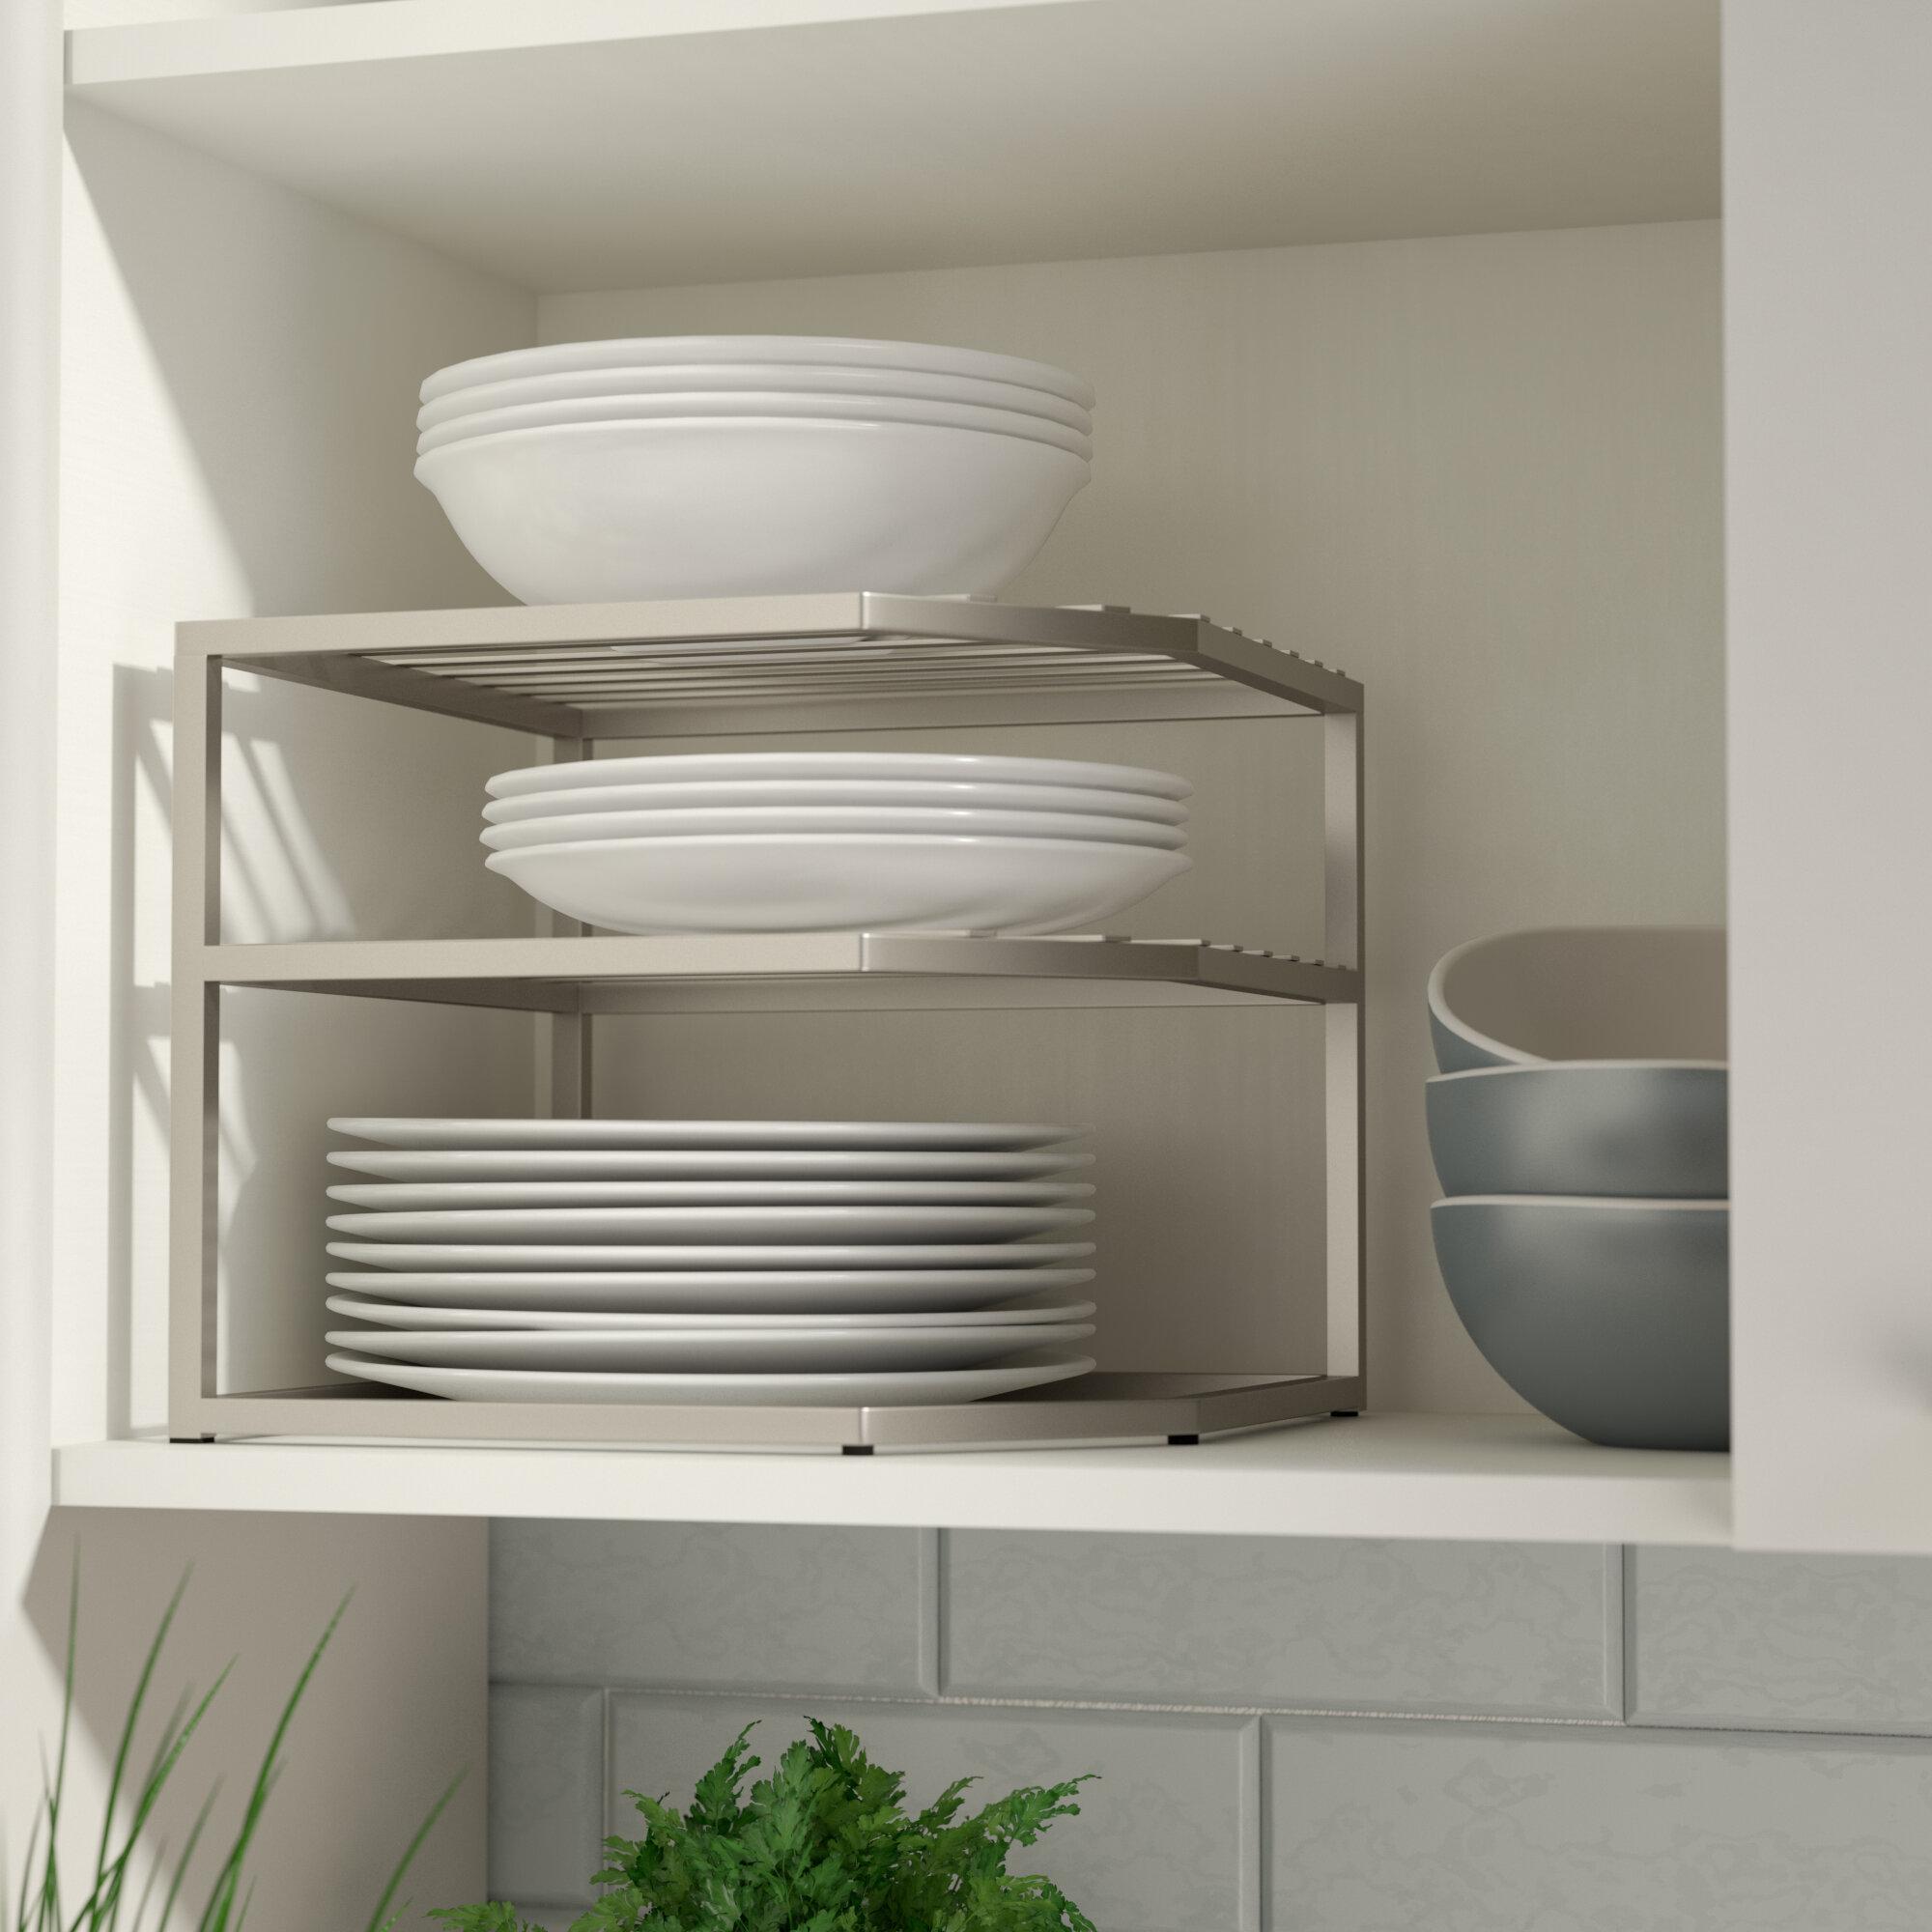 Wayfair Basics Corner Kitchen Cabinet Organizer Shelving Rack Reviews Wayfair